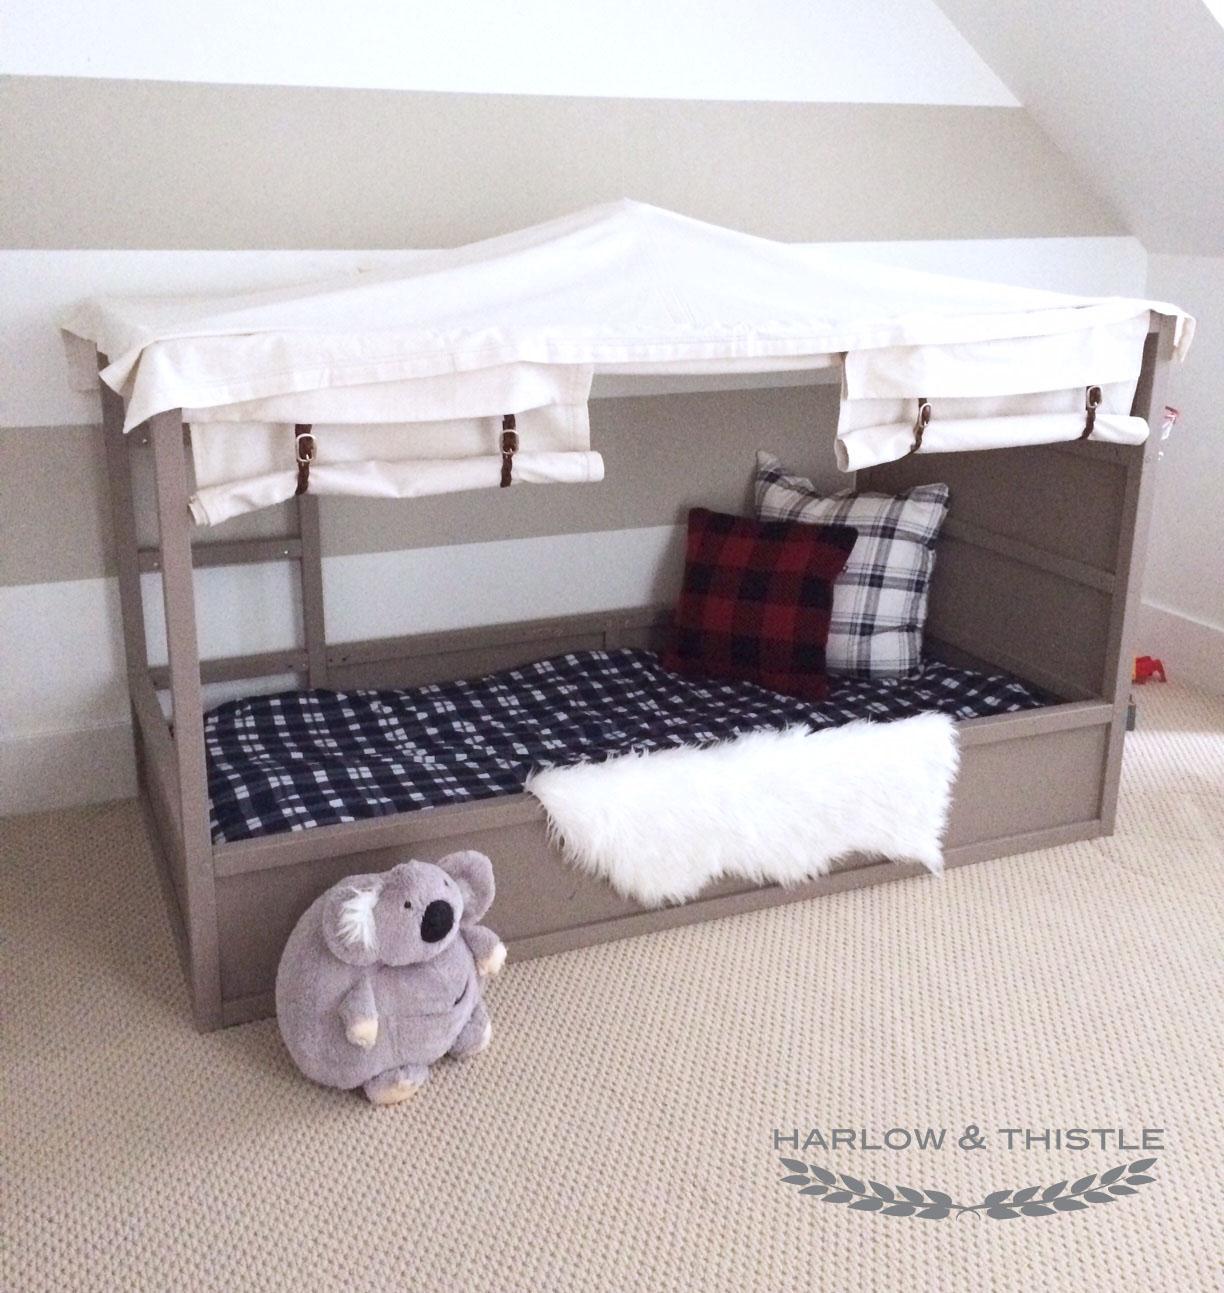 Full Size of Kura Hack Ikea Bed Diy Boy Canopy Harlow Thistle Home Wohnzimmer Kura Hack